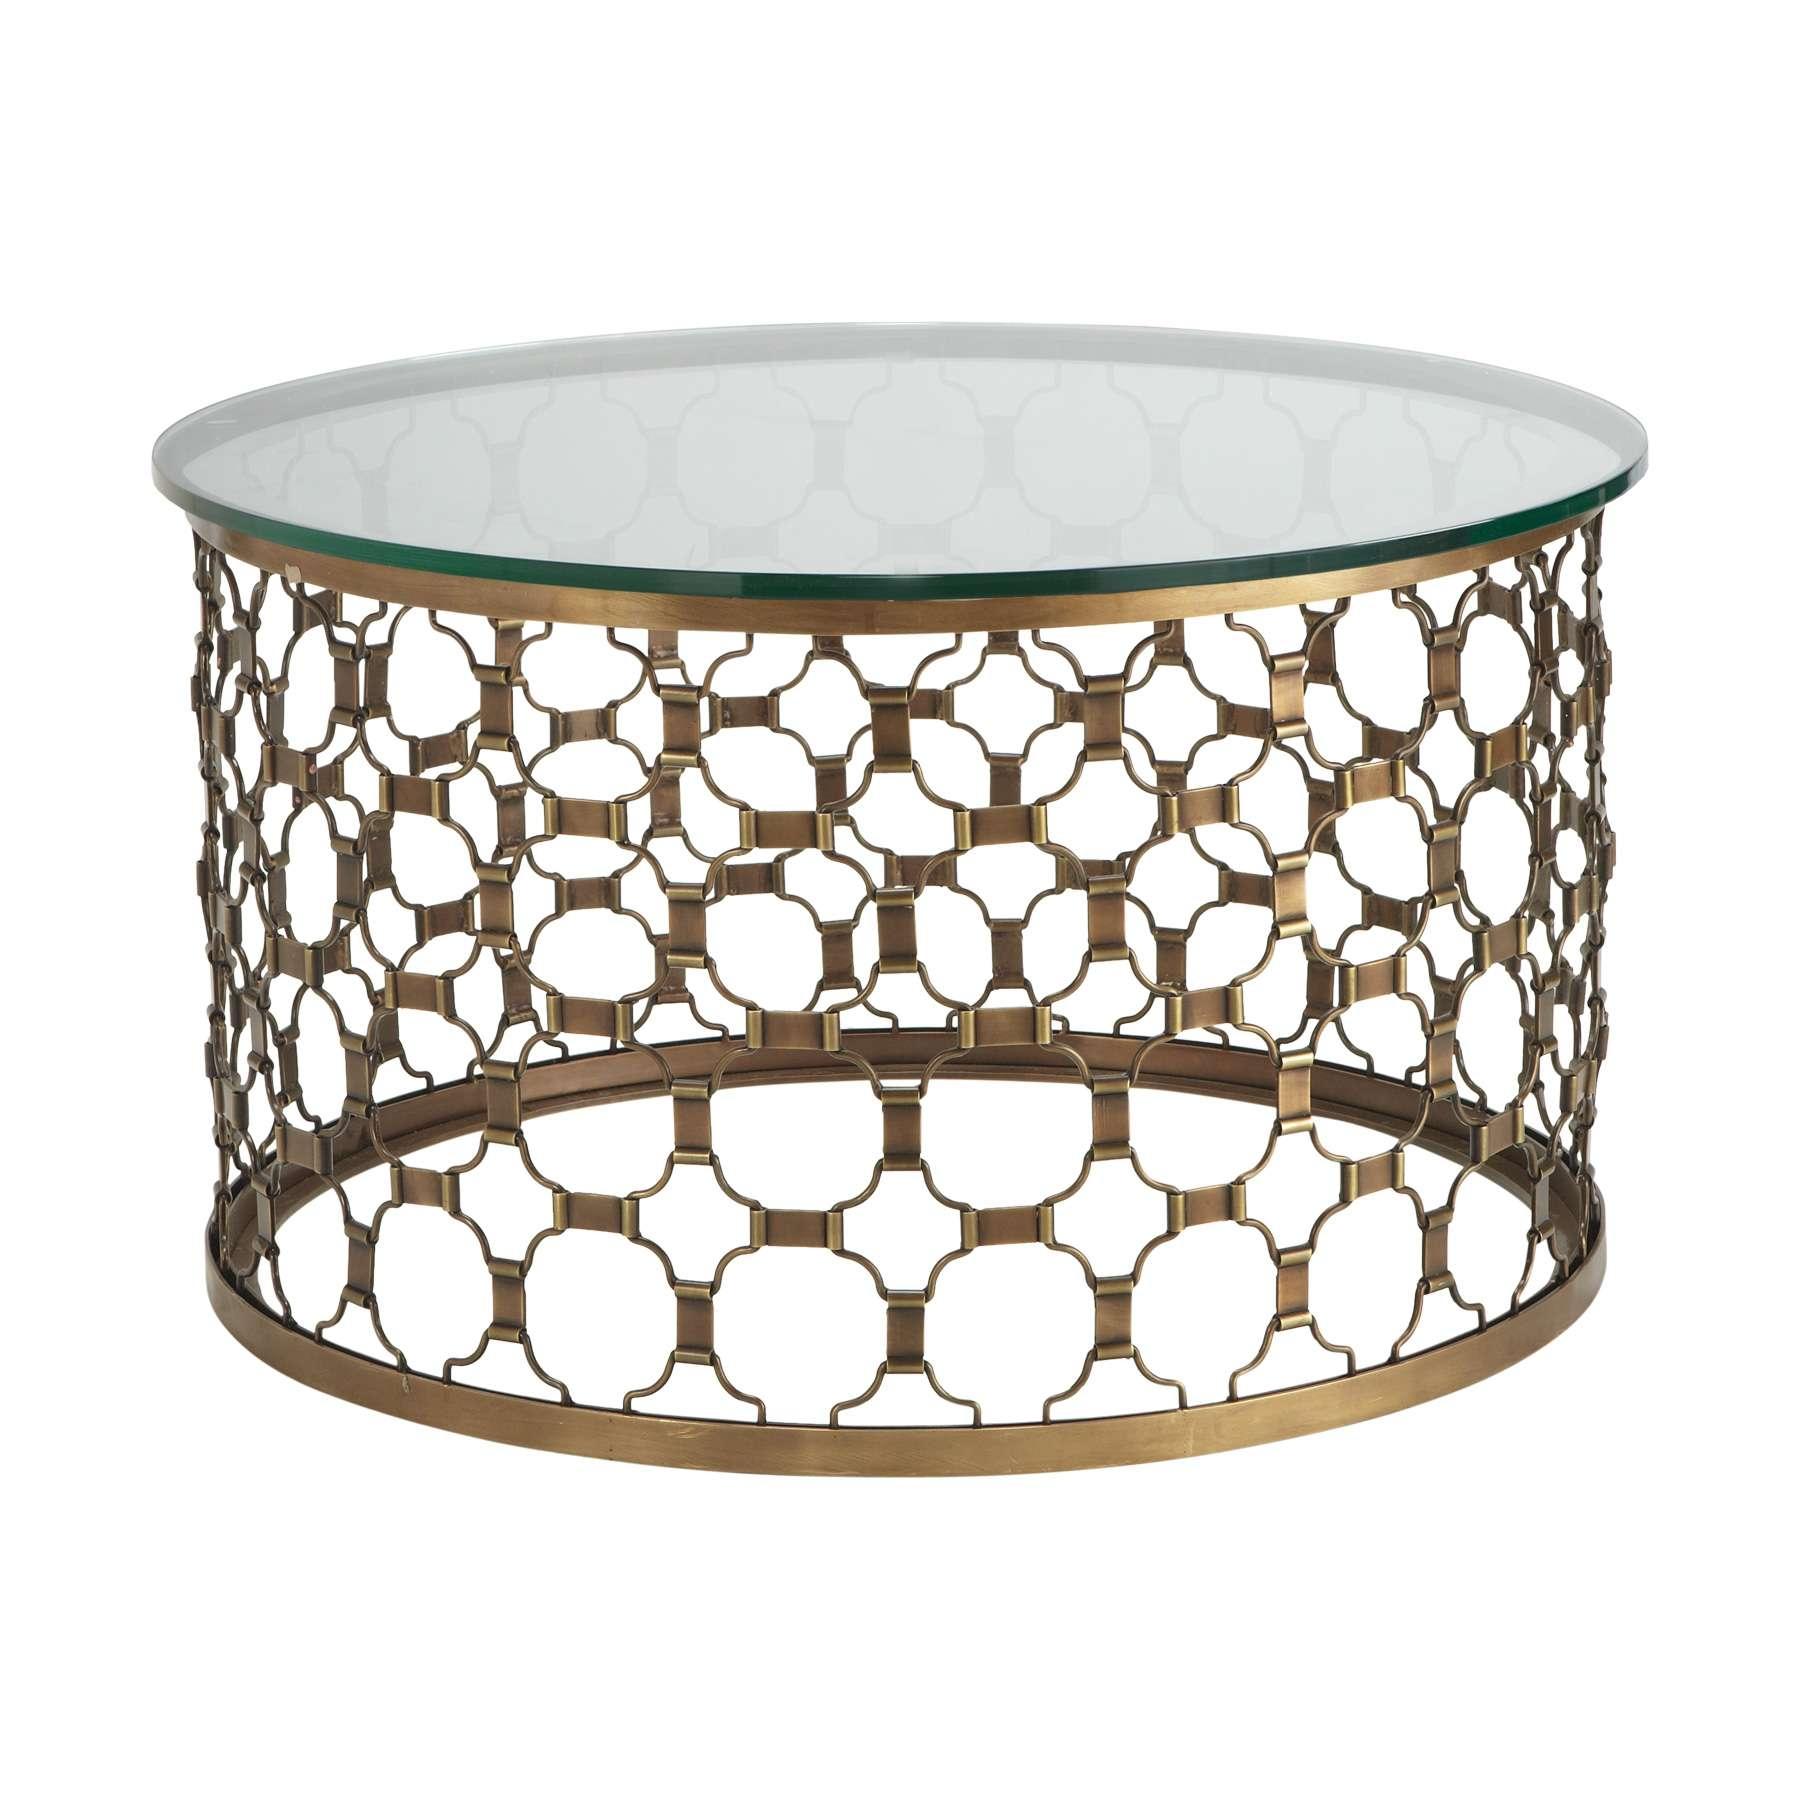 Coffee Table : Naomi 30Inch Round Coffee Table Elegant Gold Metal Regarding Favorite Metal Round Coffee Tables (View 5 of 20)